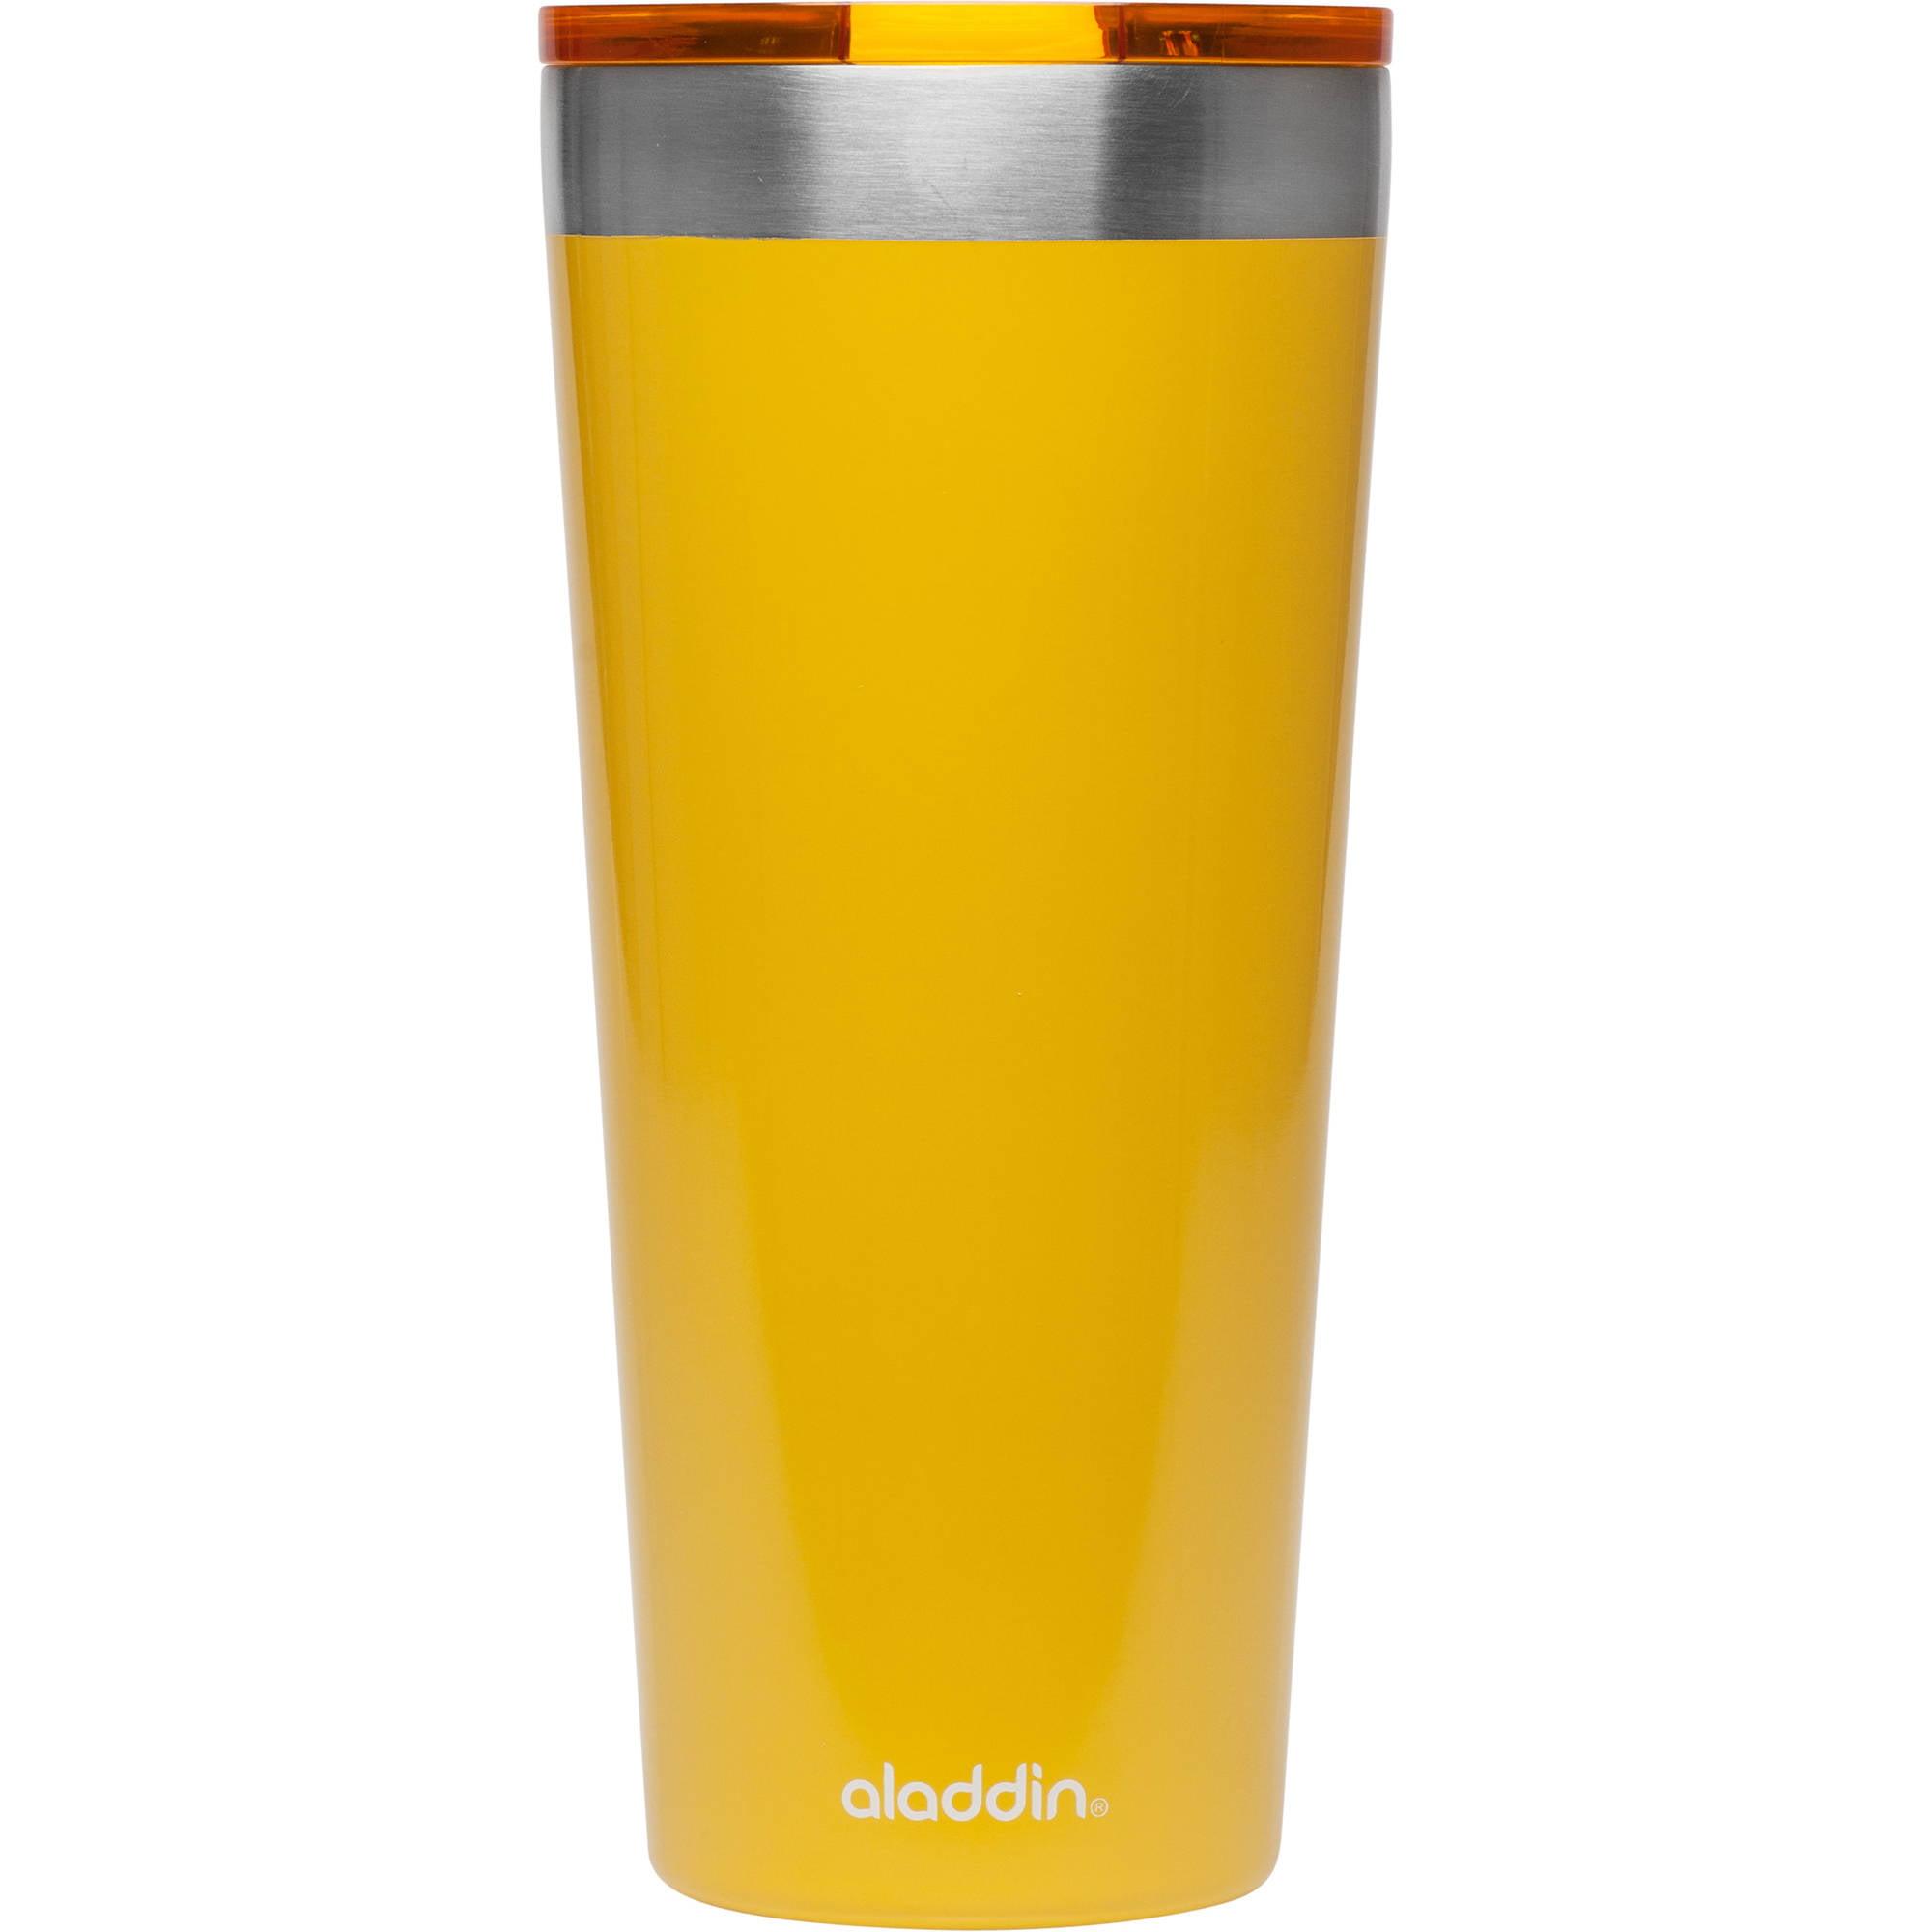 05c6898e928 Aladdin 30 Ounce Stainless Steel Vacuum Yellow Tumbler - Walmart.com